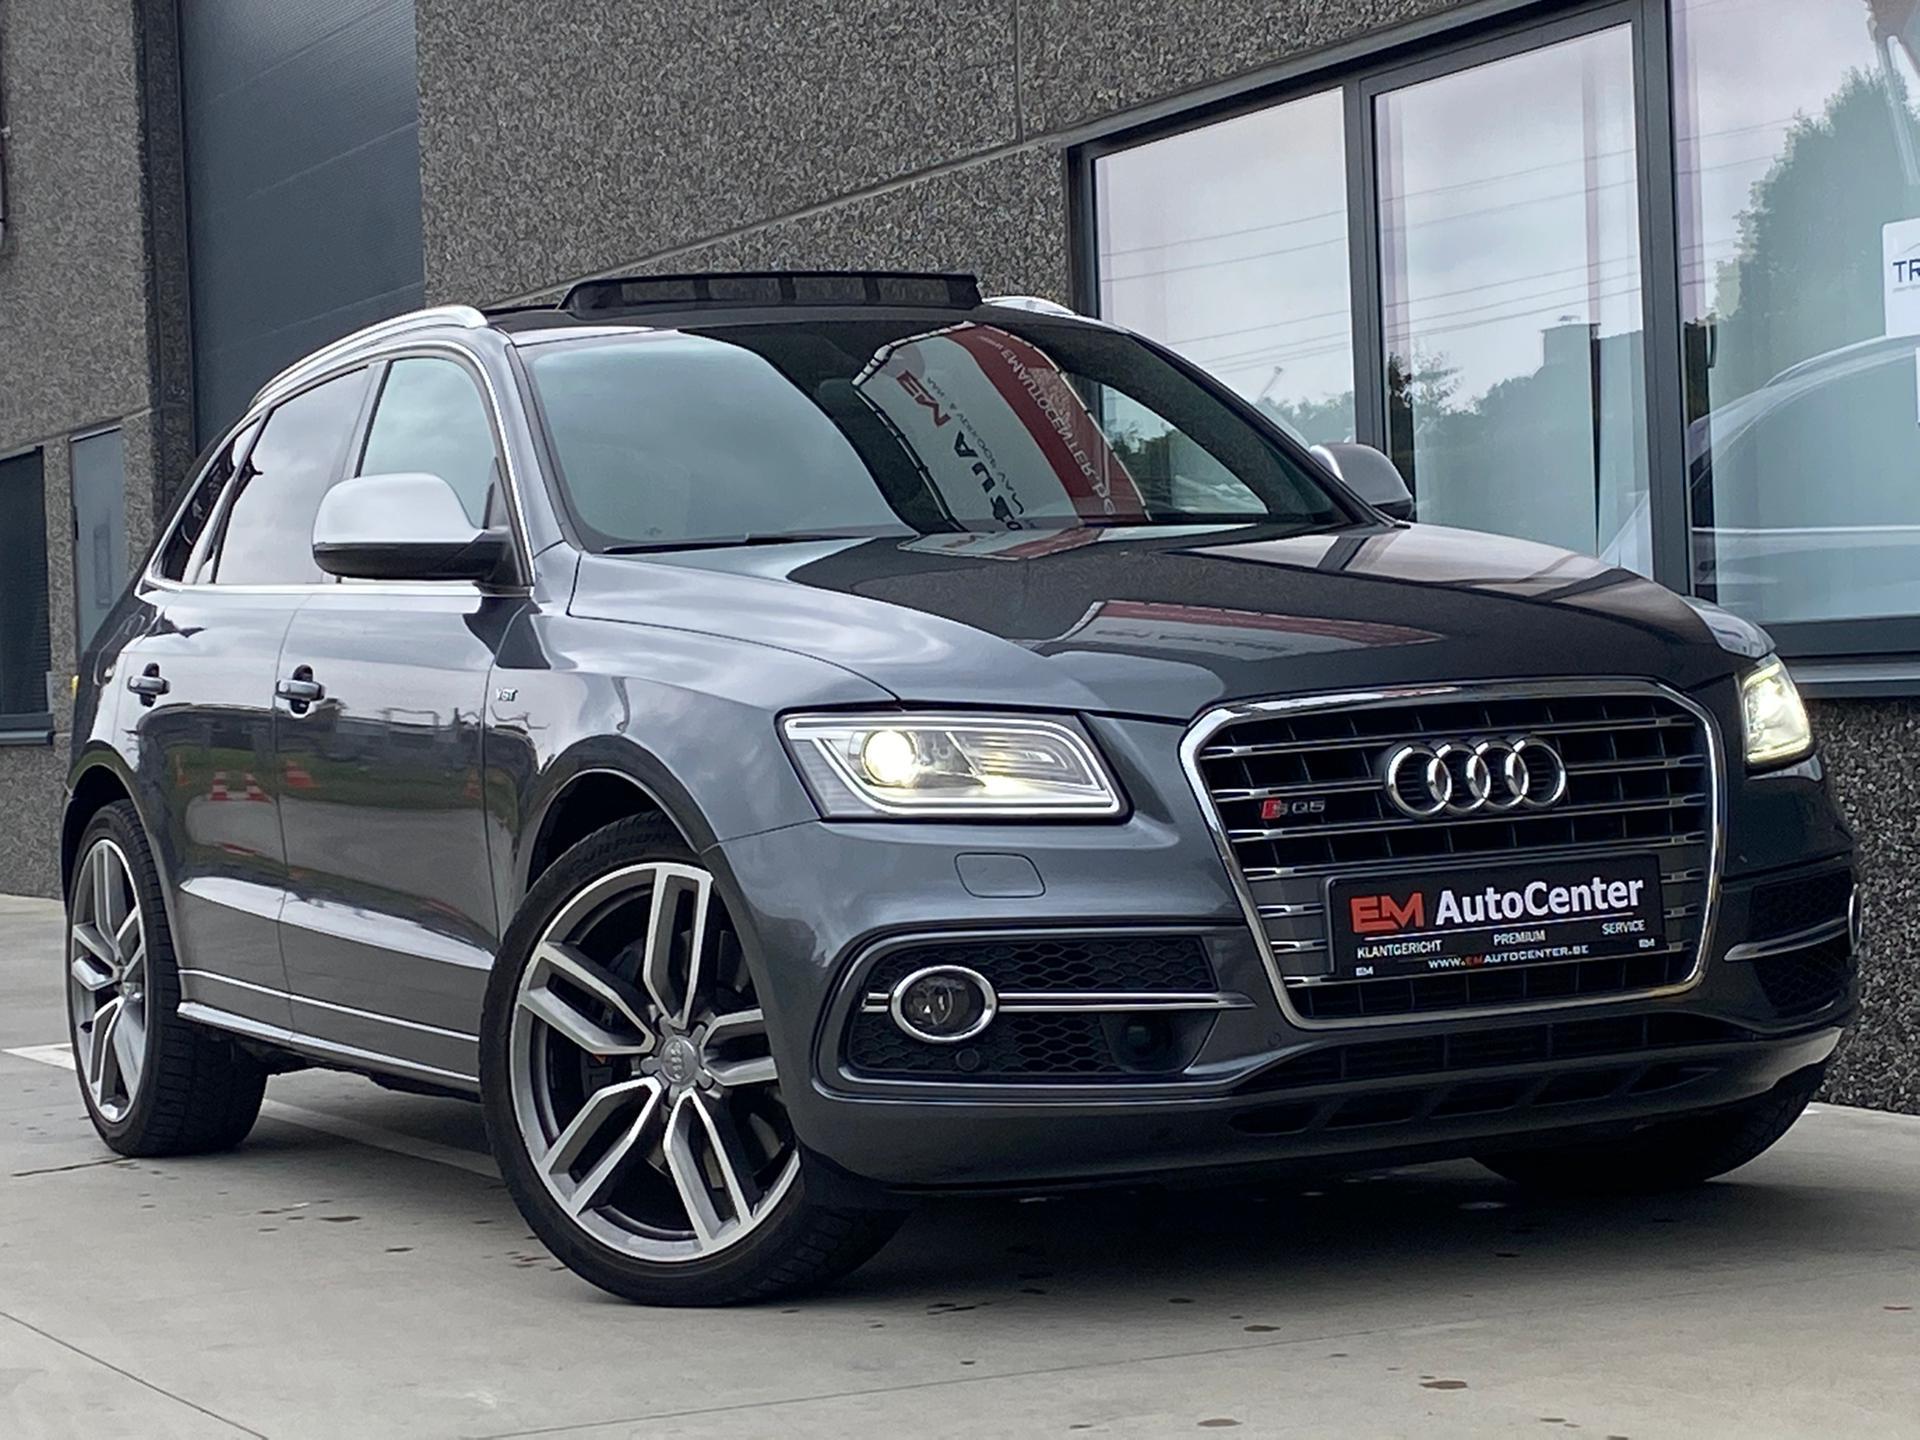 Audi SQ5 Pano